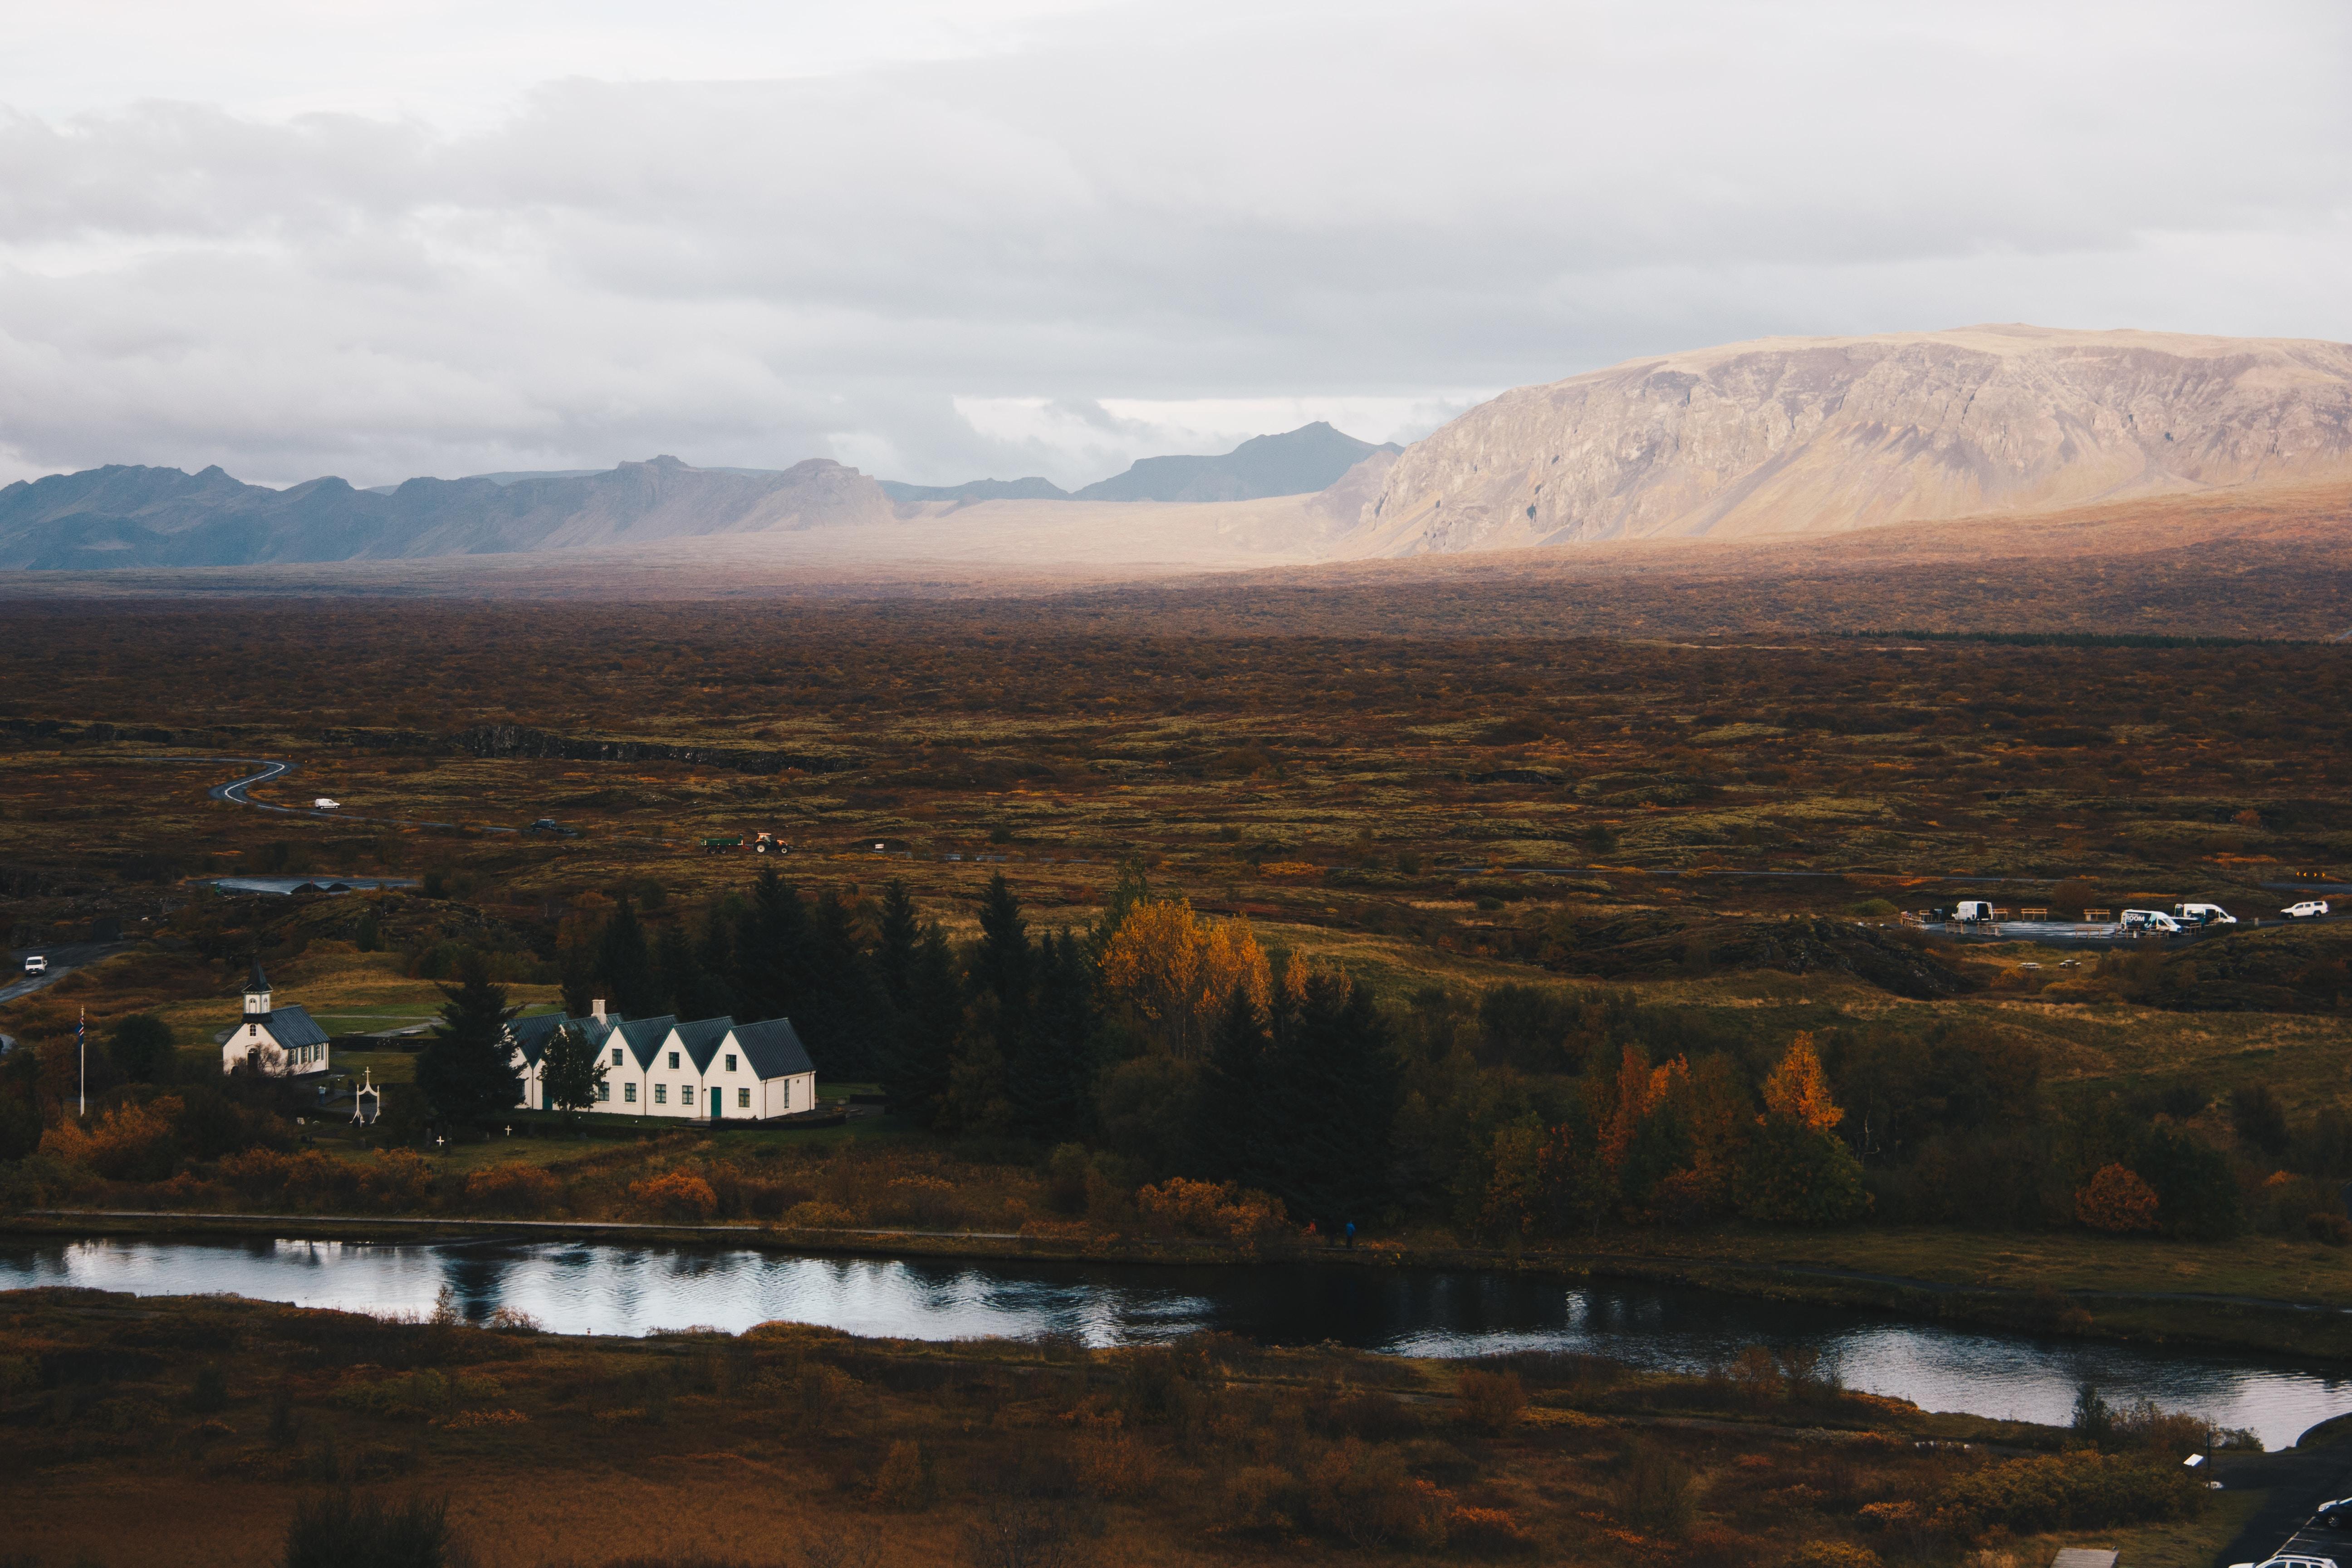 house near lake under white sky during daytime